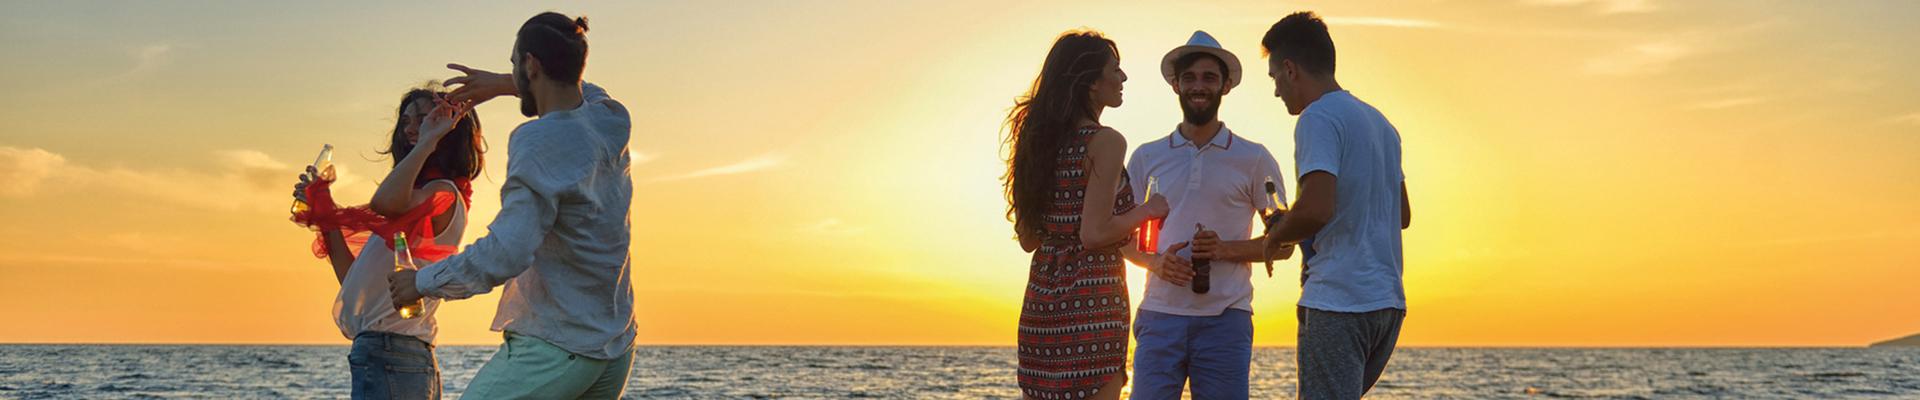 Workshop: Lovefilds, Beziehungen achtsam leben lernen